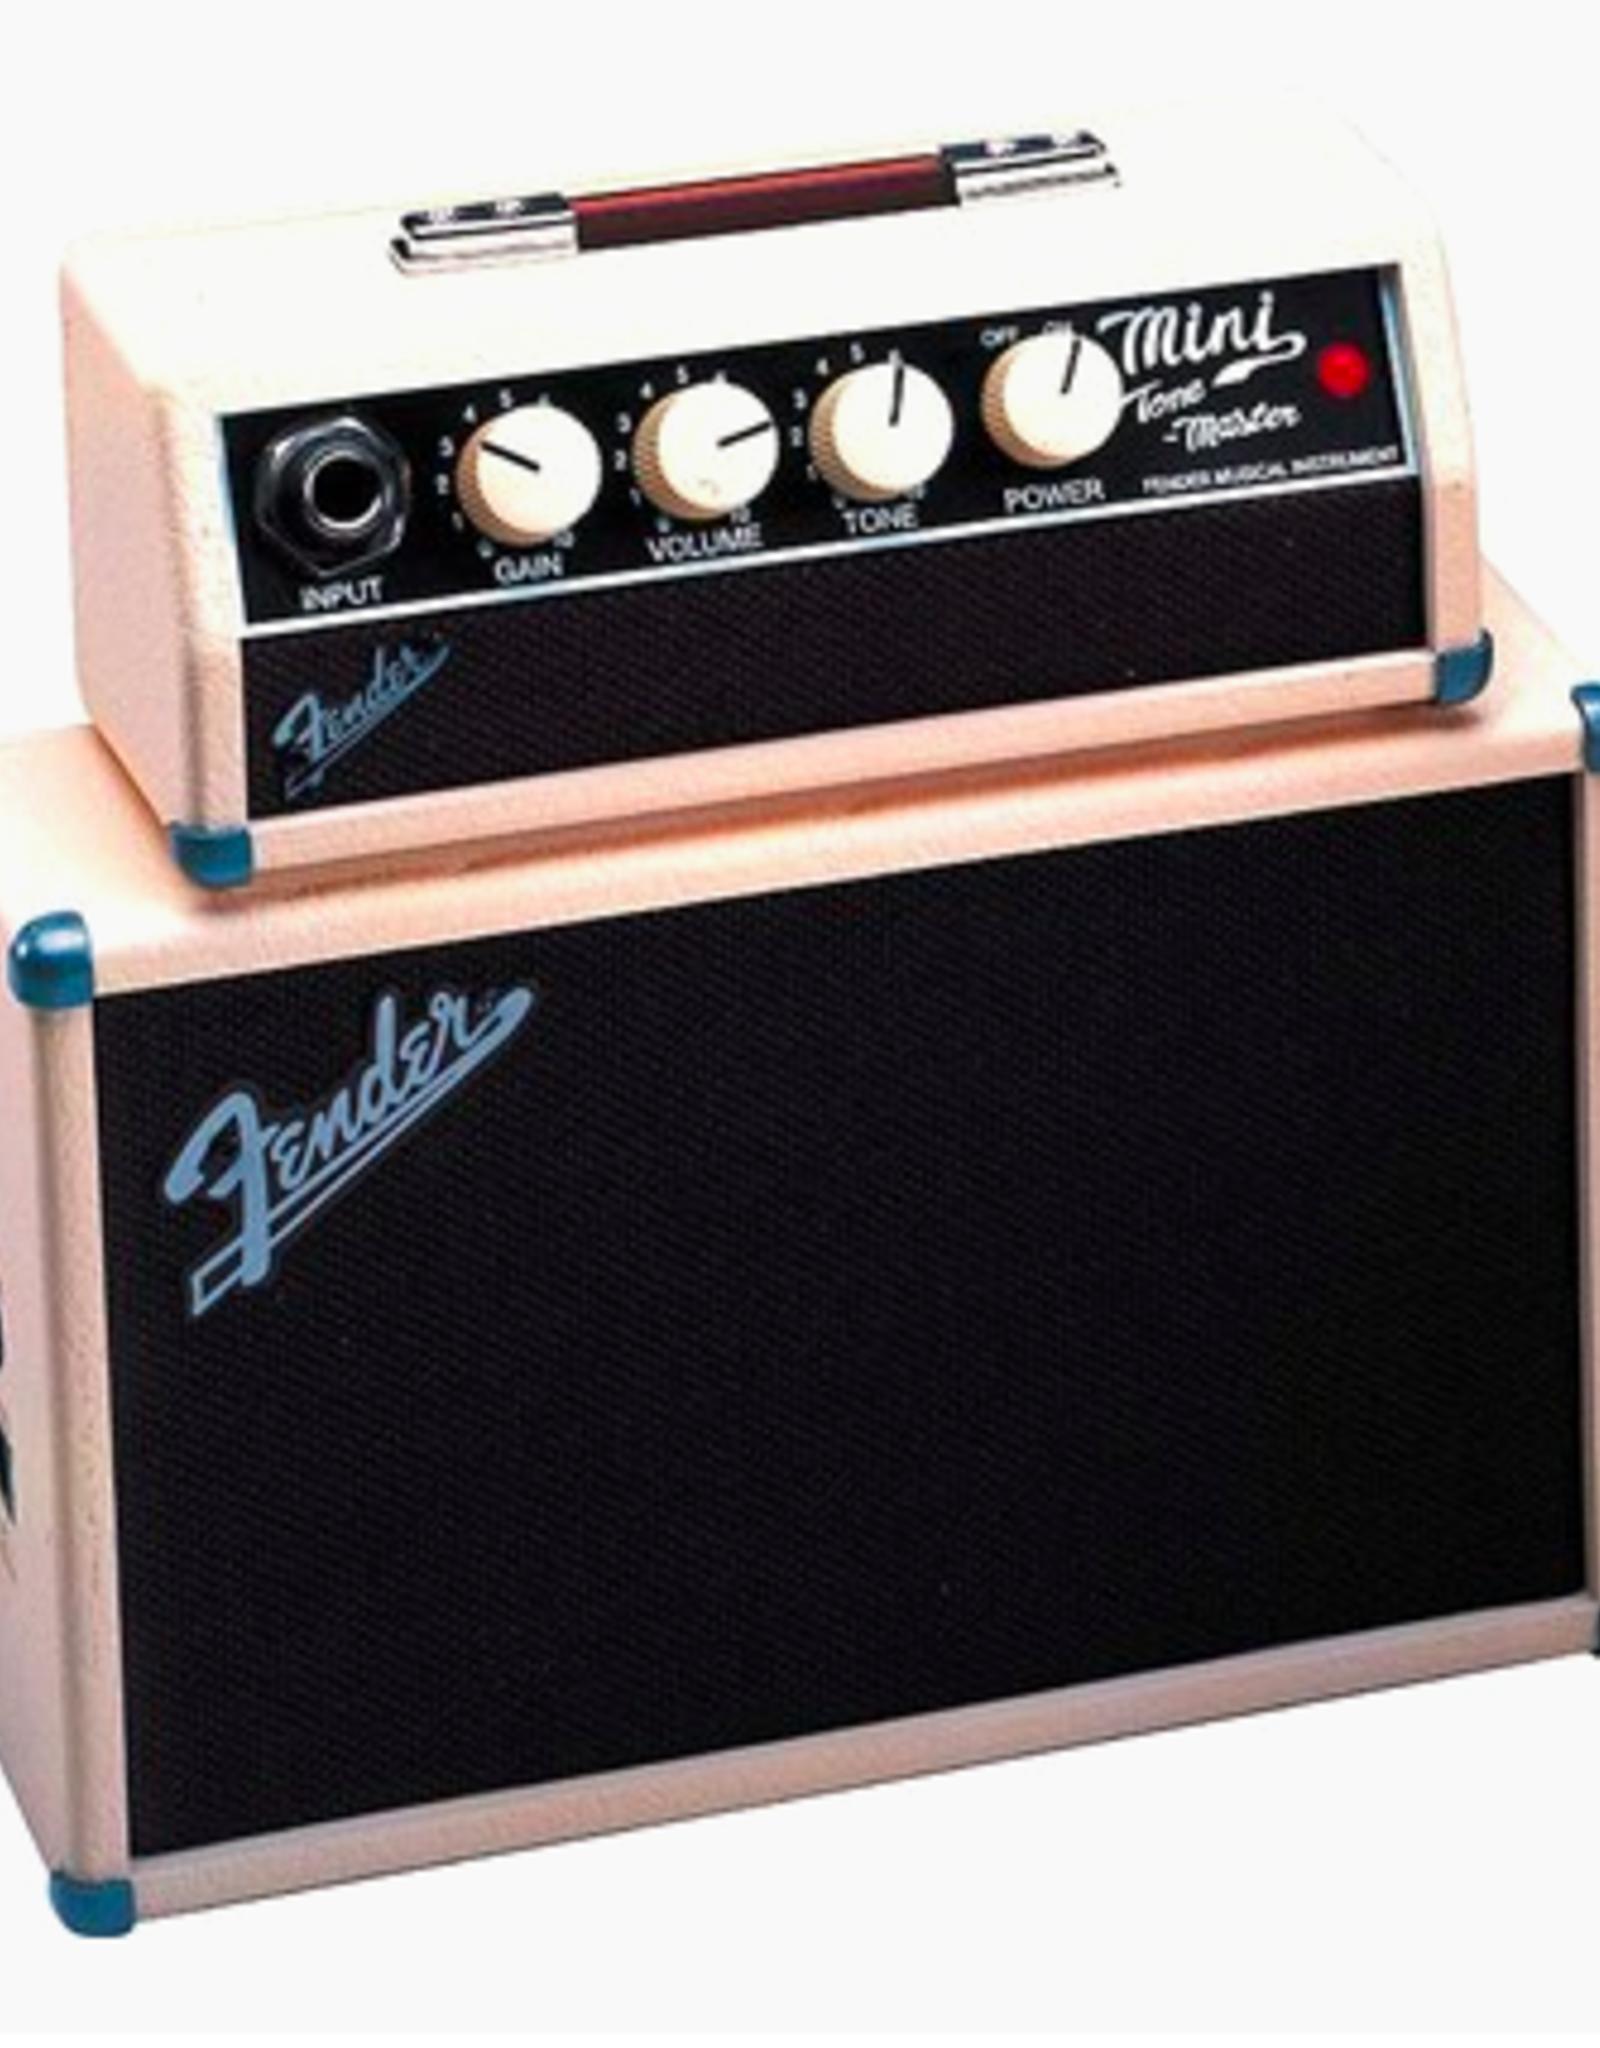 Fender Fender Mini Tonemaster Amplifier, Tan/Brown